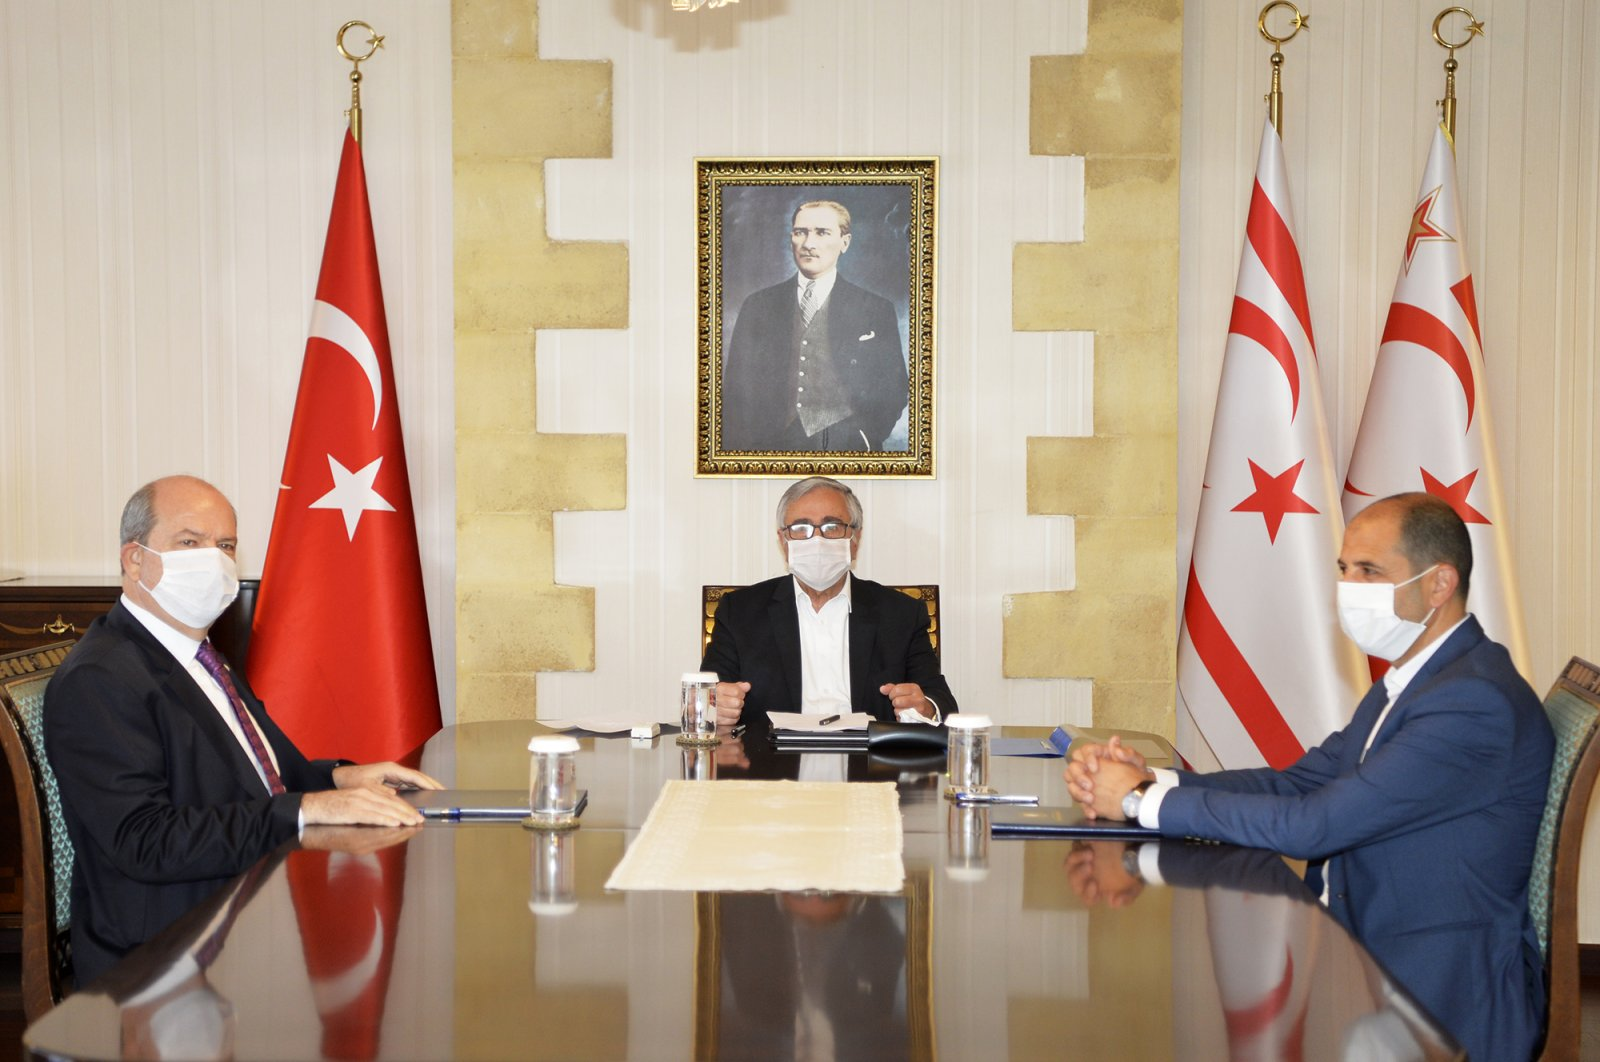 TRNC President Mustafa Akıncı (Center) holds meeting with Prime Minister Ersin Tatar and Foreign Minister Kudret Özersay to discuss developments regarding coronavirus outbreak on April 9, 2020. (AA Photo)